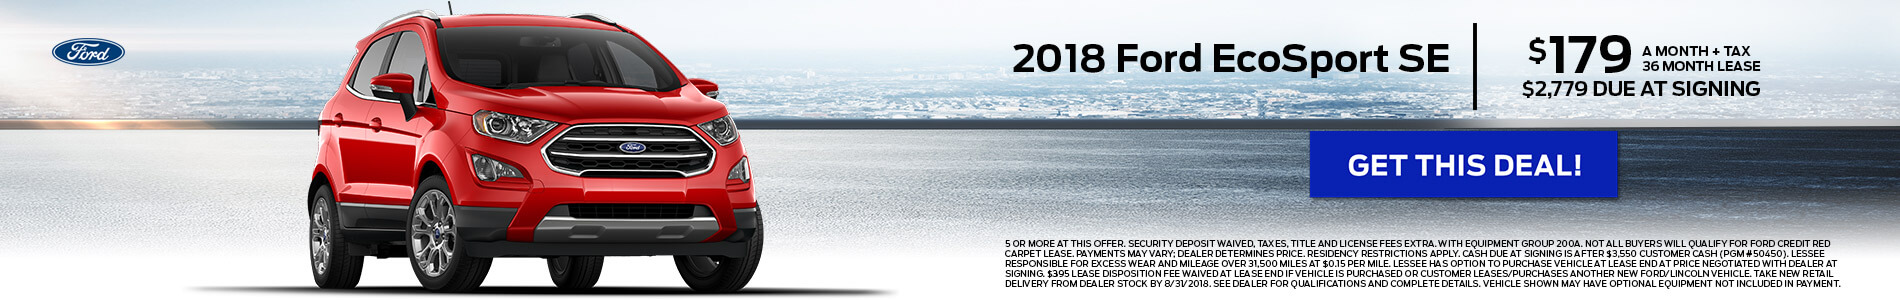 2018 Ford EcoSport $179